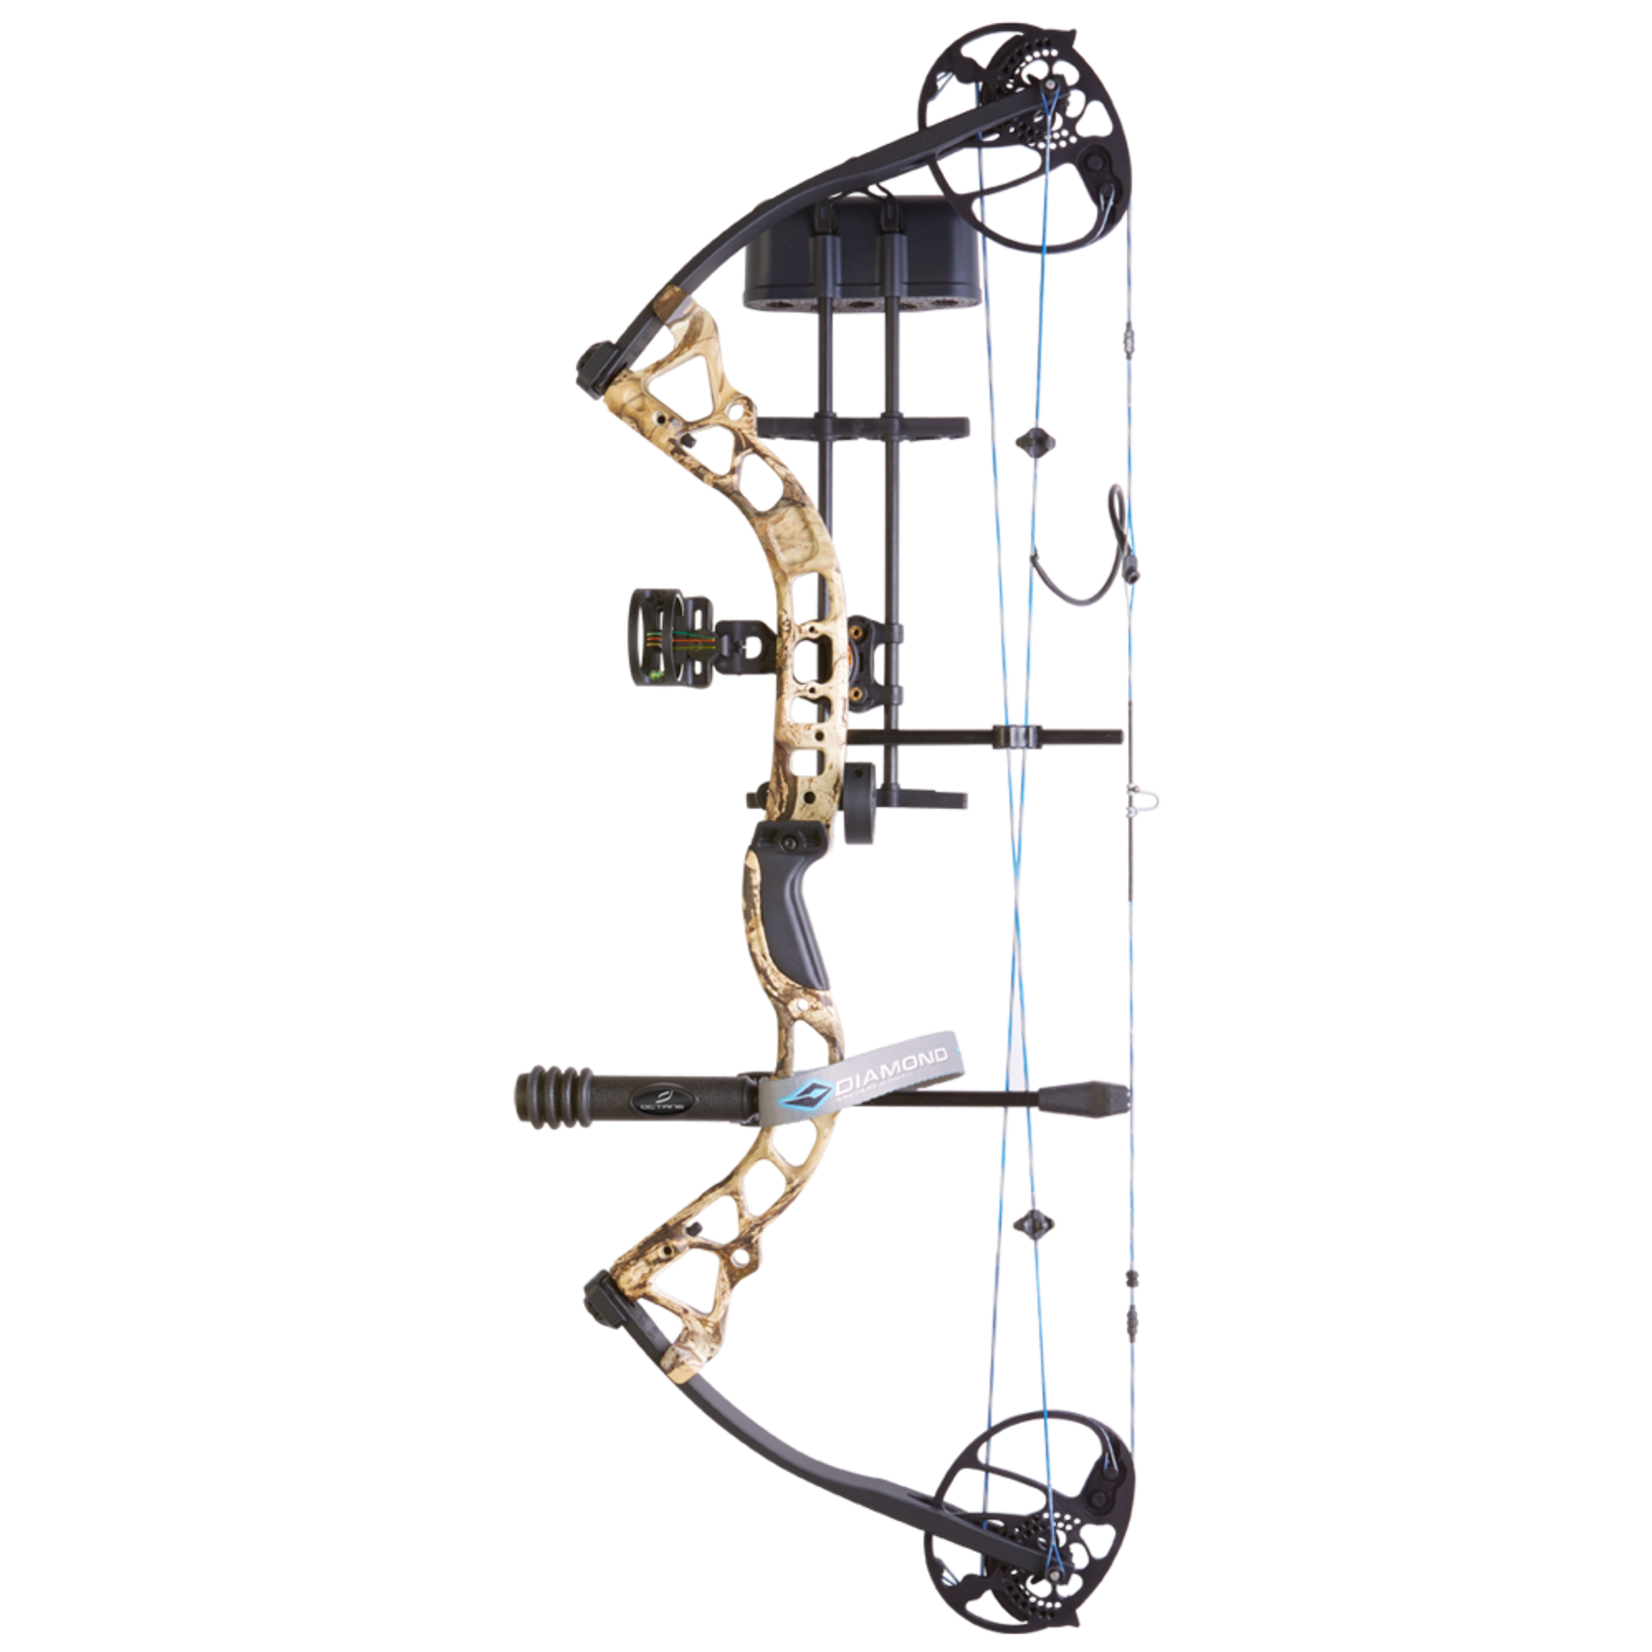 Diamond Archery Infinite Edge Pro Rh 5-70# Breakup Country W/Pkg